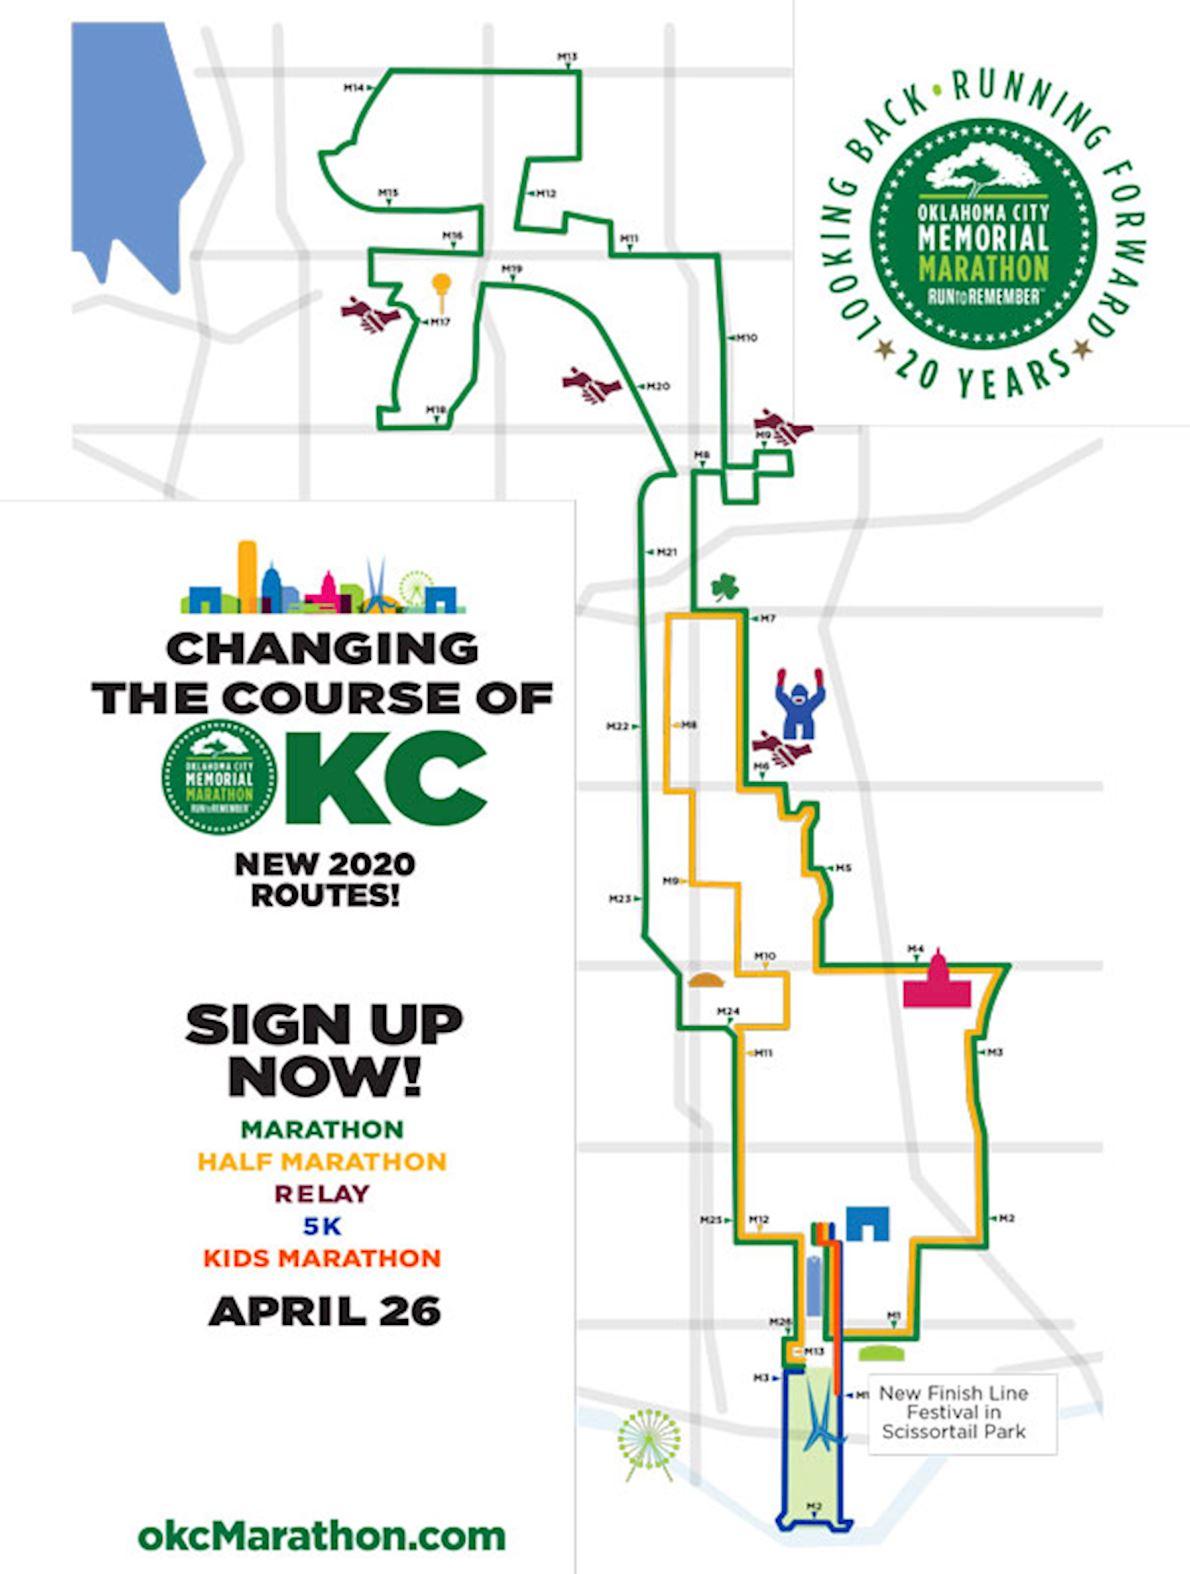 Oklahoma City Memorial Marathon Mappa del percorso